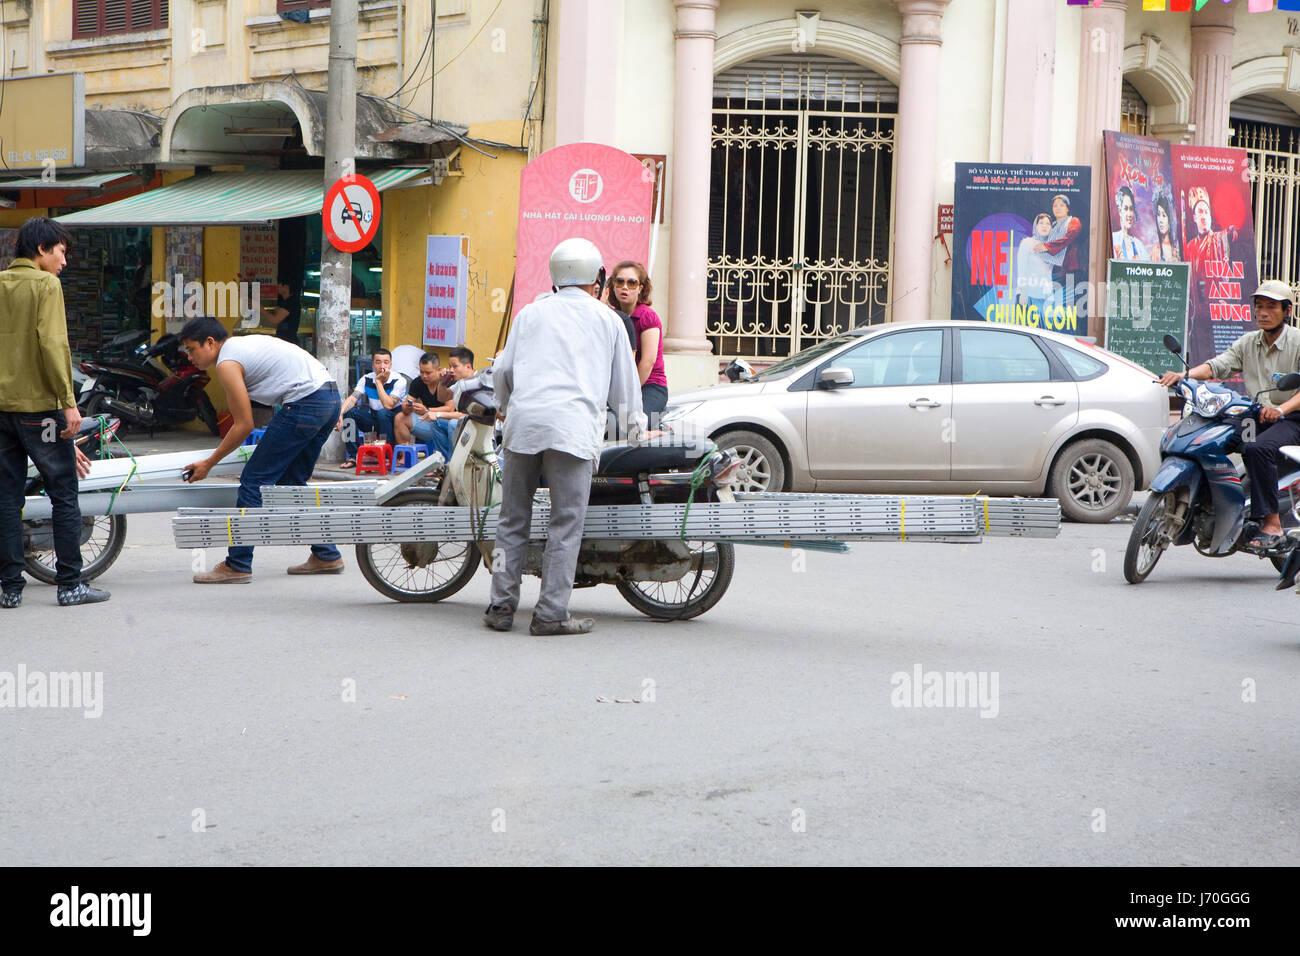 Urban scene with loaded motorbikes in Hanoi, Vietnam - Stock Image